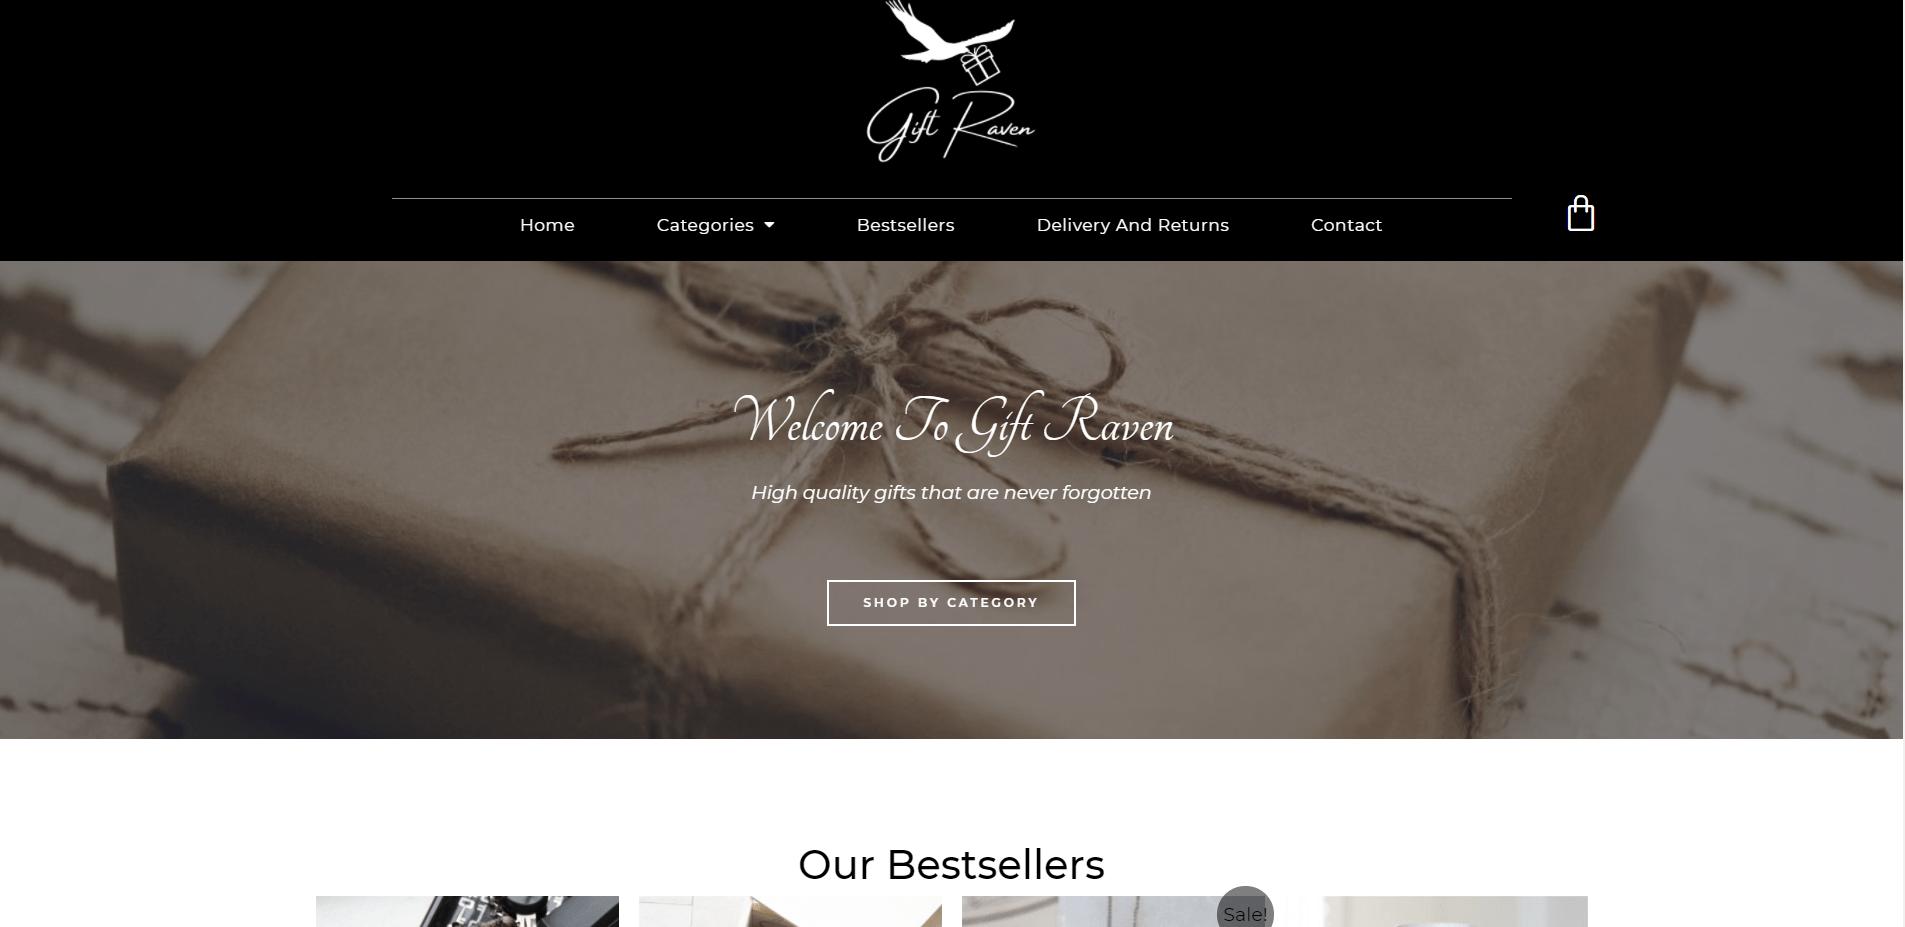 Gift Raven Image Web Design